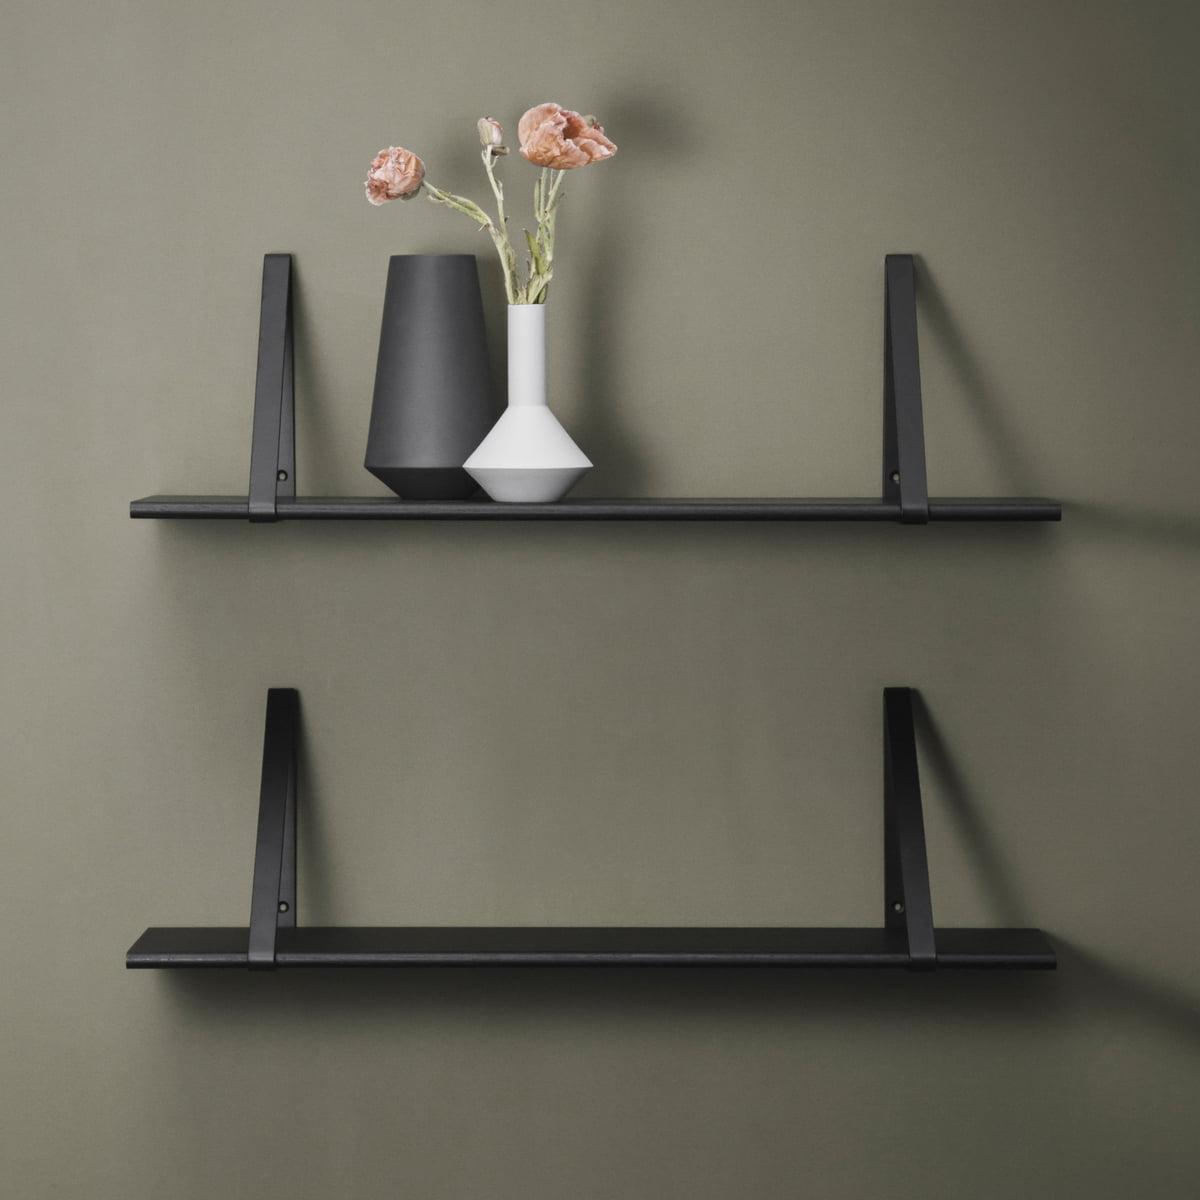 shelf hangers regalsystem von ferm living connox. Black Bedroom Furniture Sets. Home Design Ideas